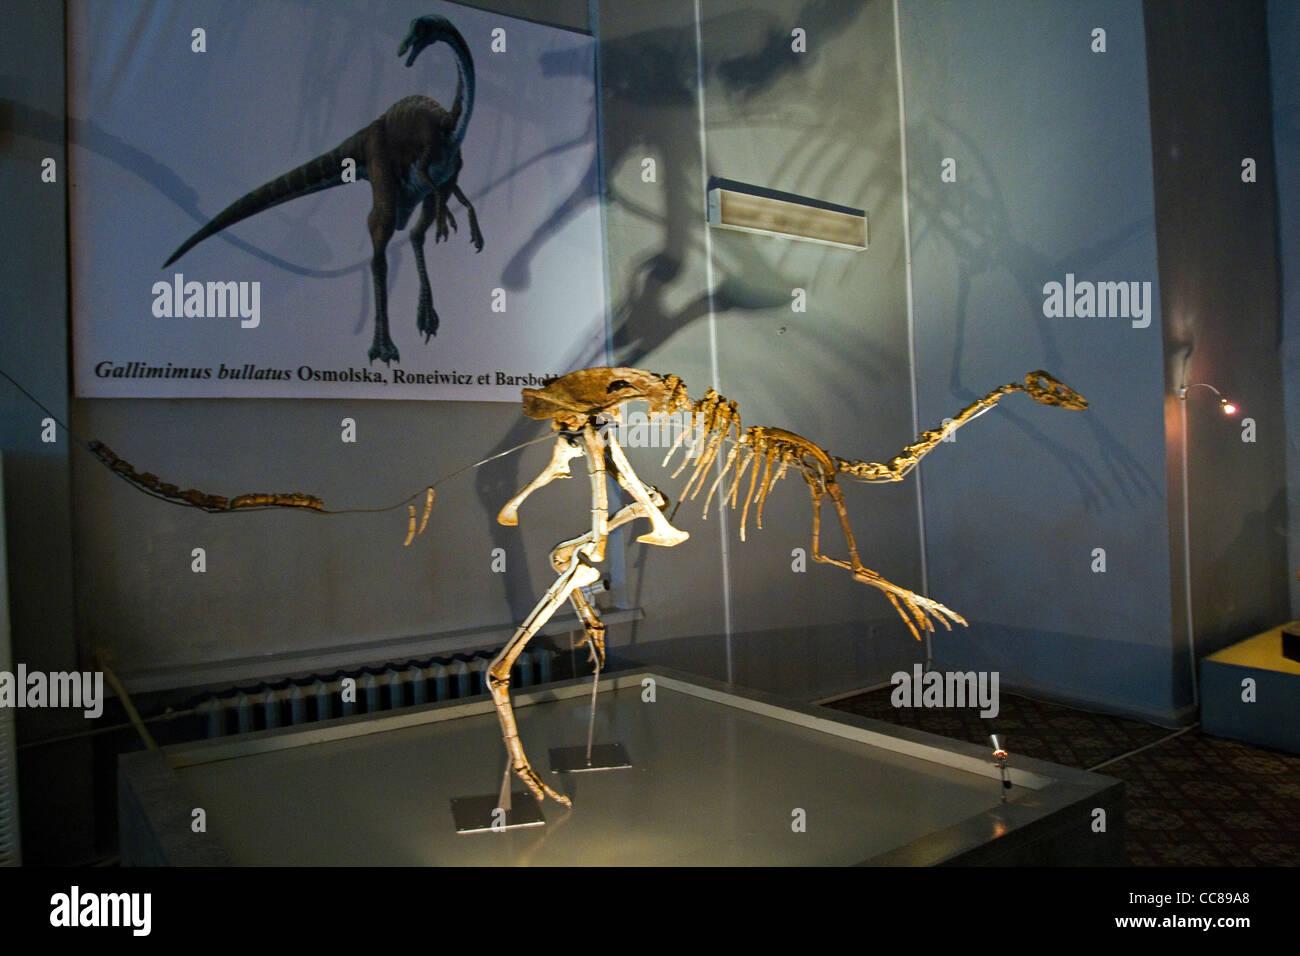 Dinosaur fossil in Natural History Museum Ulaanbaator Mongolia Stock Photo